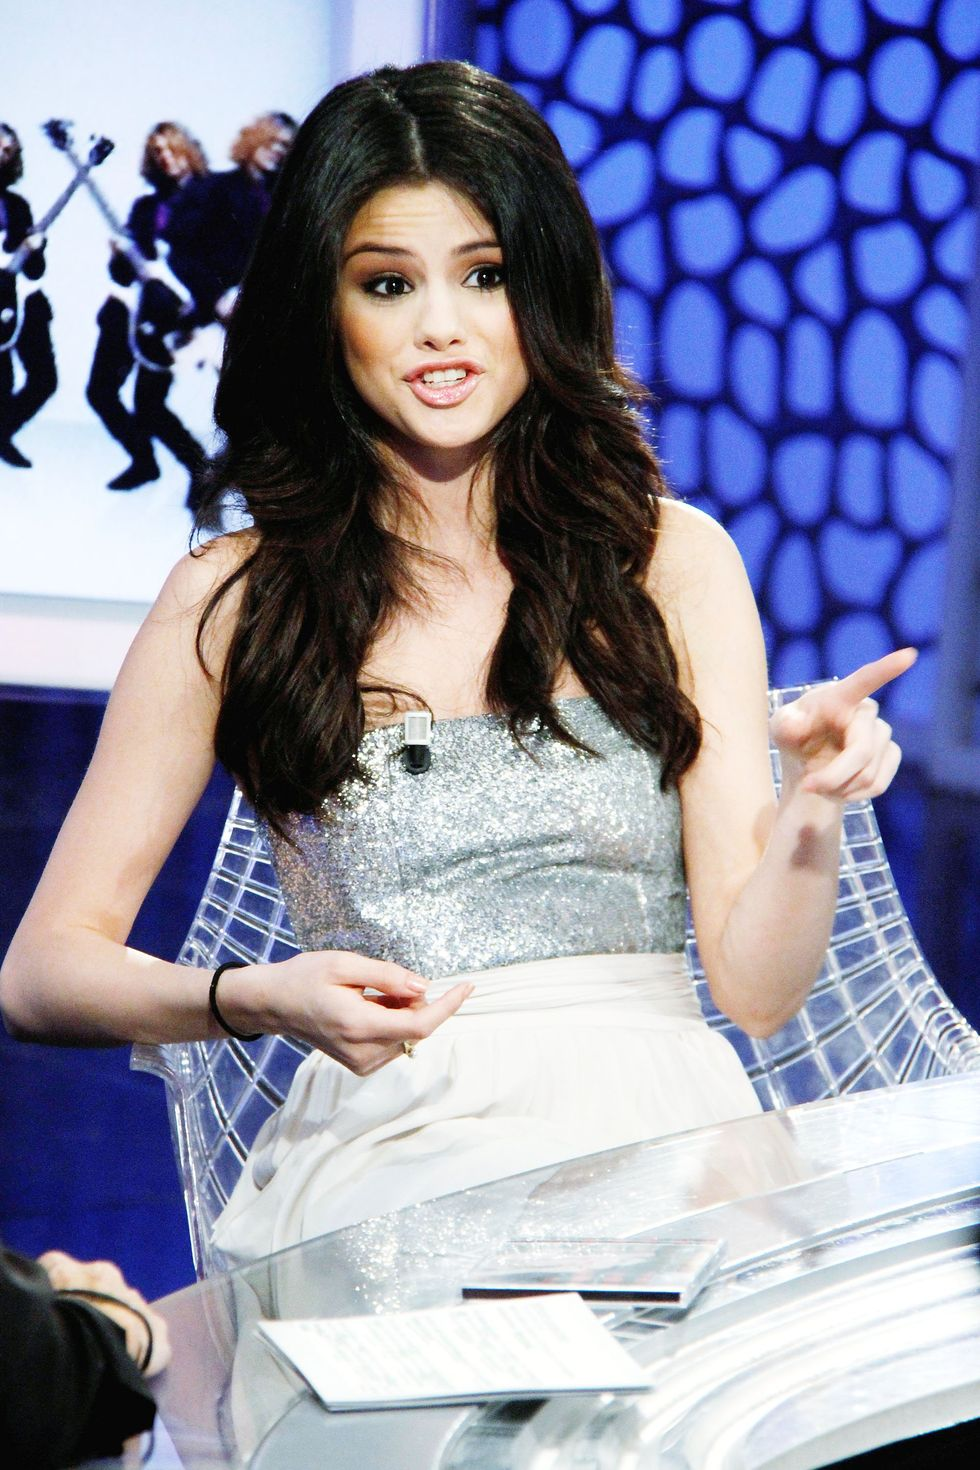 Selena Gomez 2010 : selena-gomez-el-hormiguero-tv-show-stills-hq-20